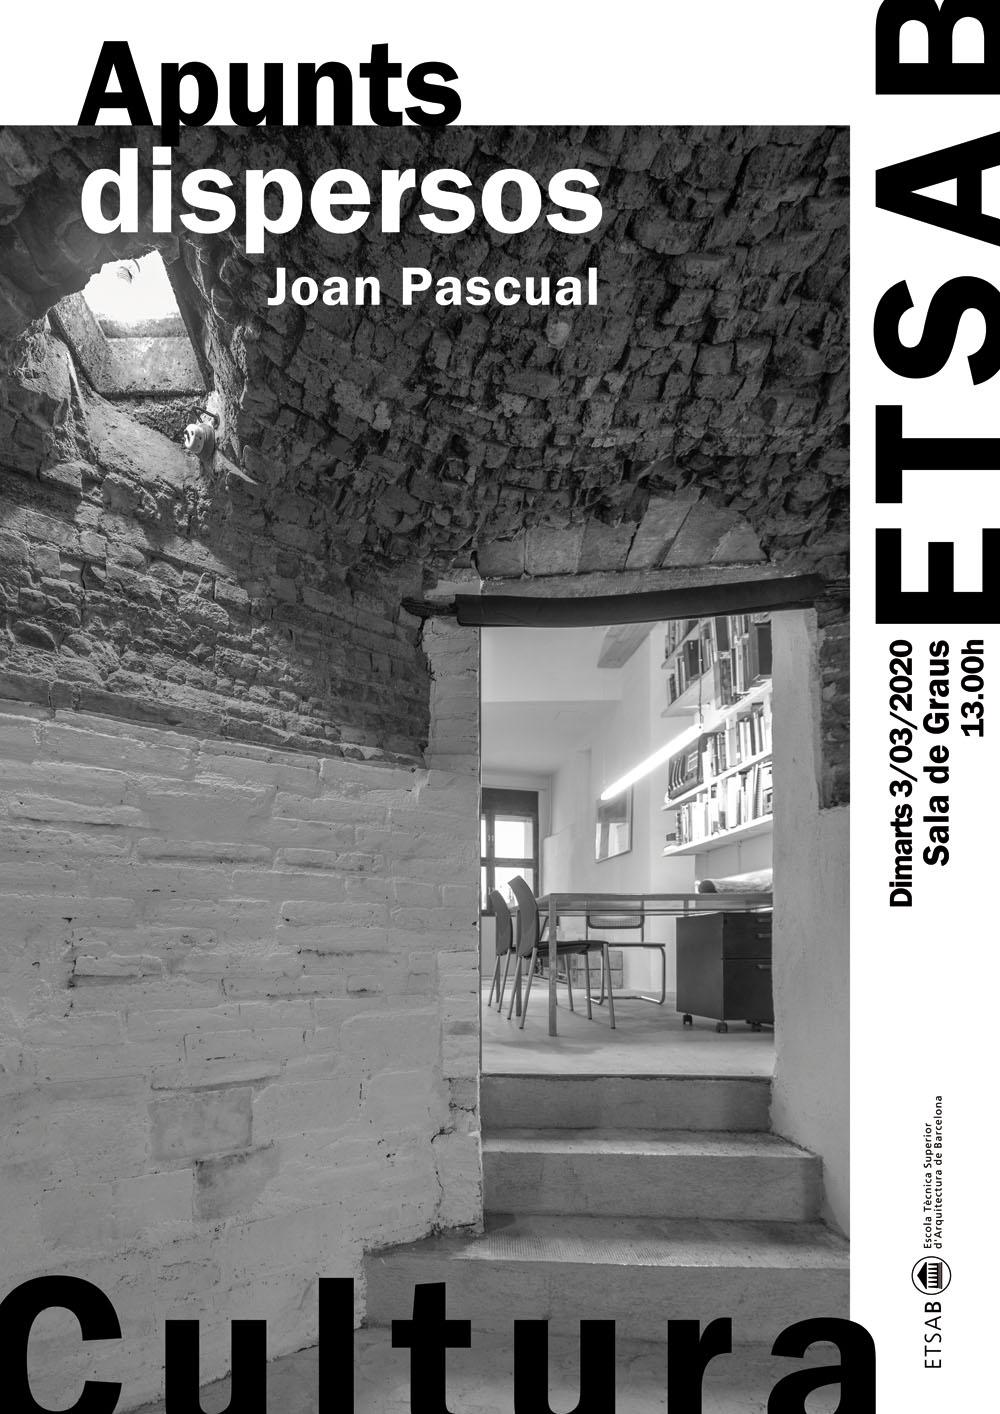 2020 02 27 Joan Pascual comprimida.jpg